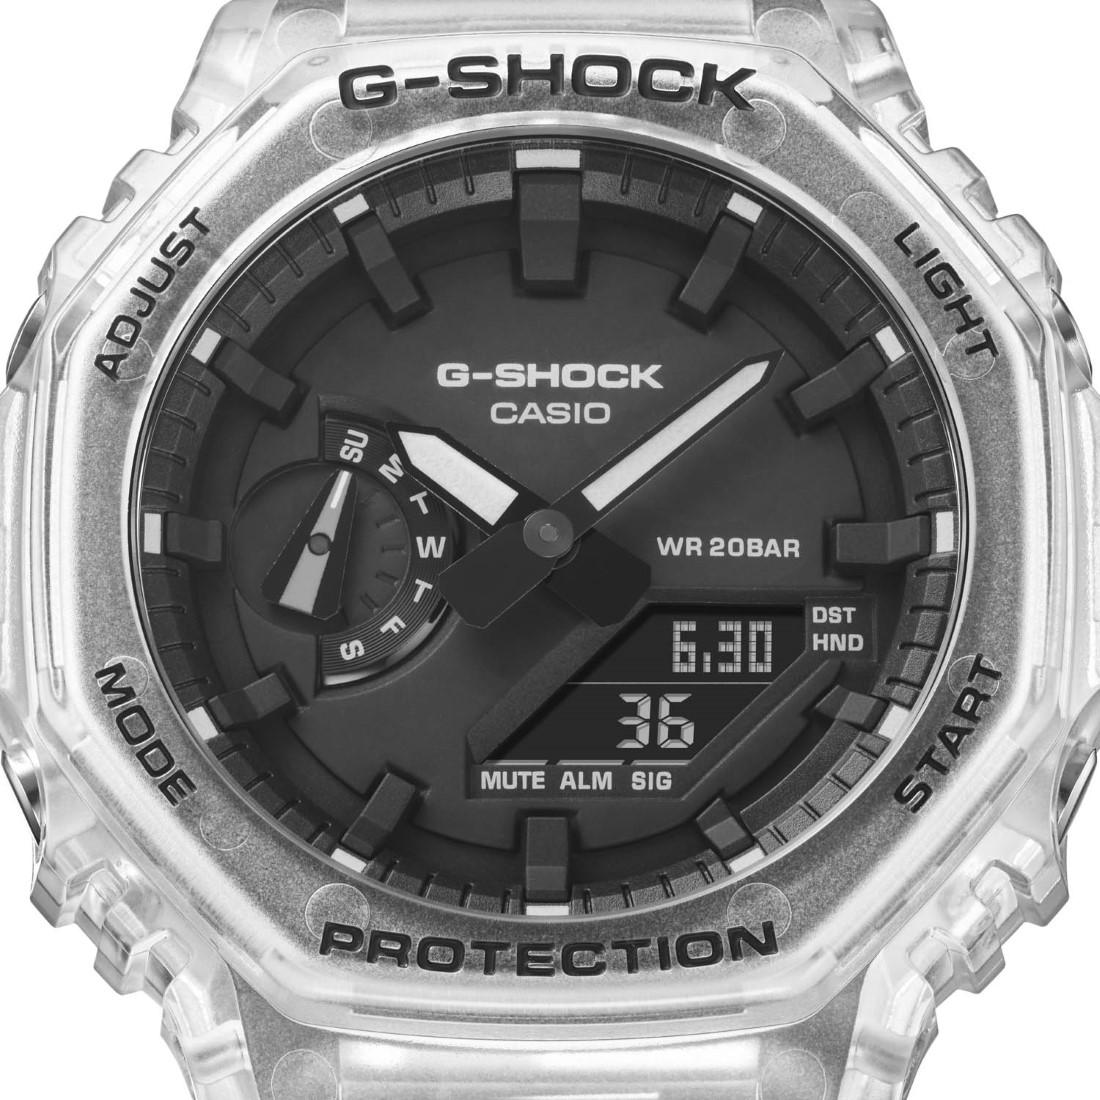 G-SHOCK Skeleton White